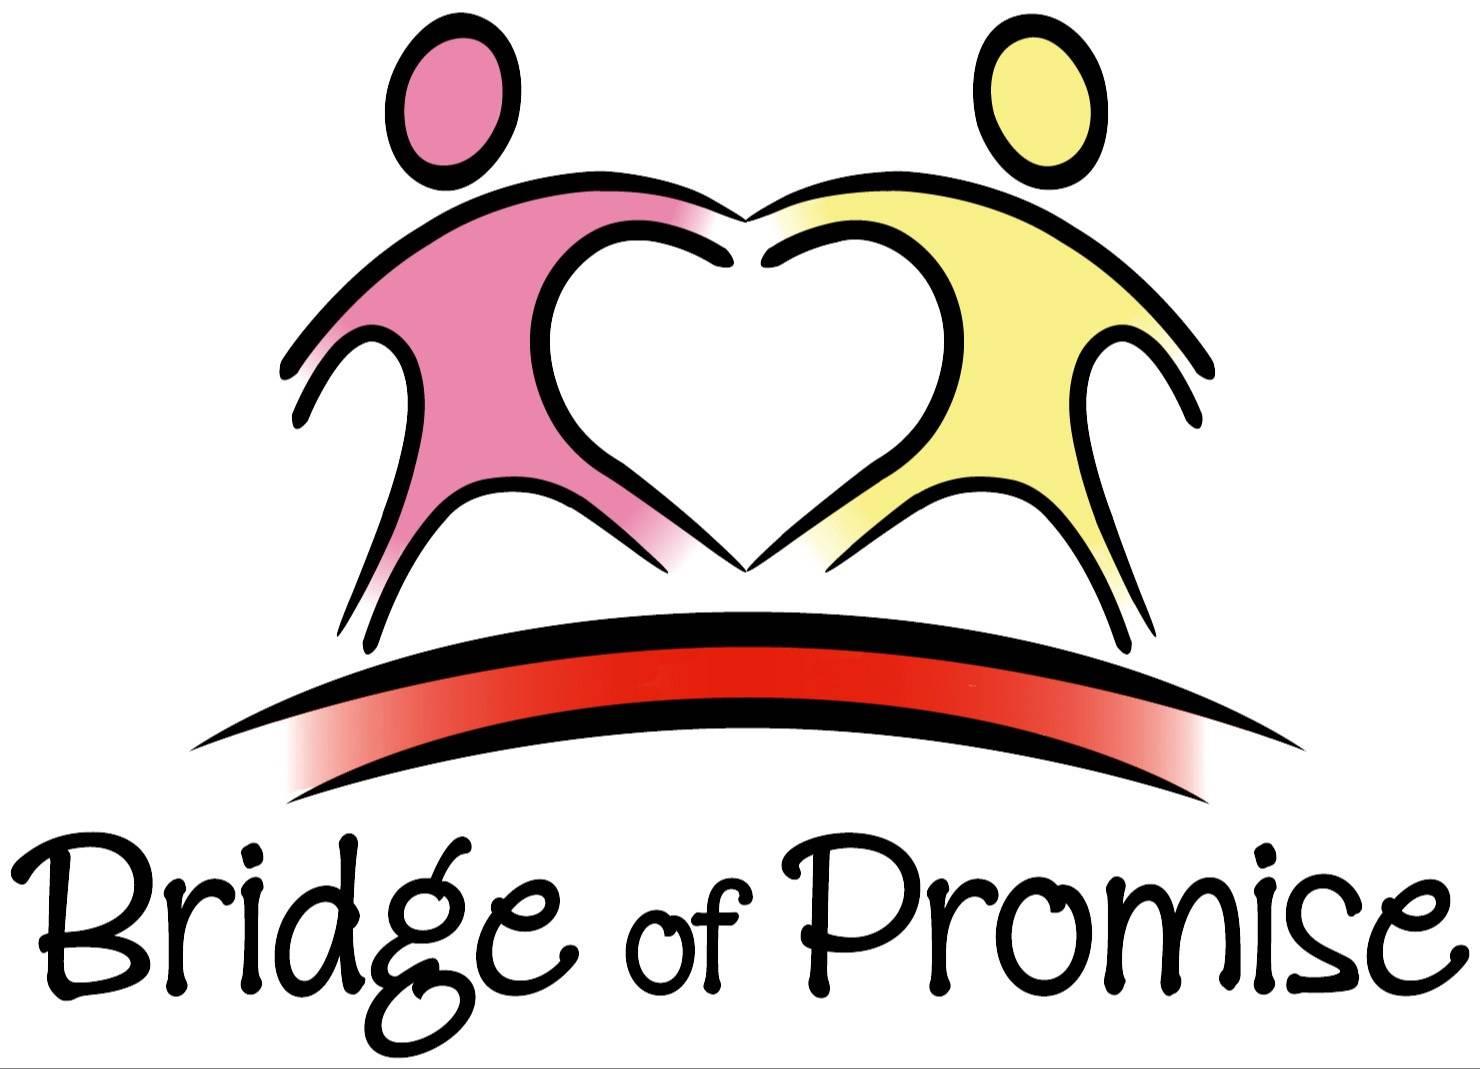 Logo of Bridge of Promise